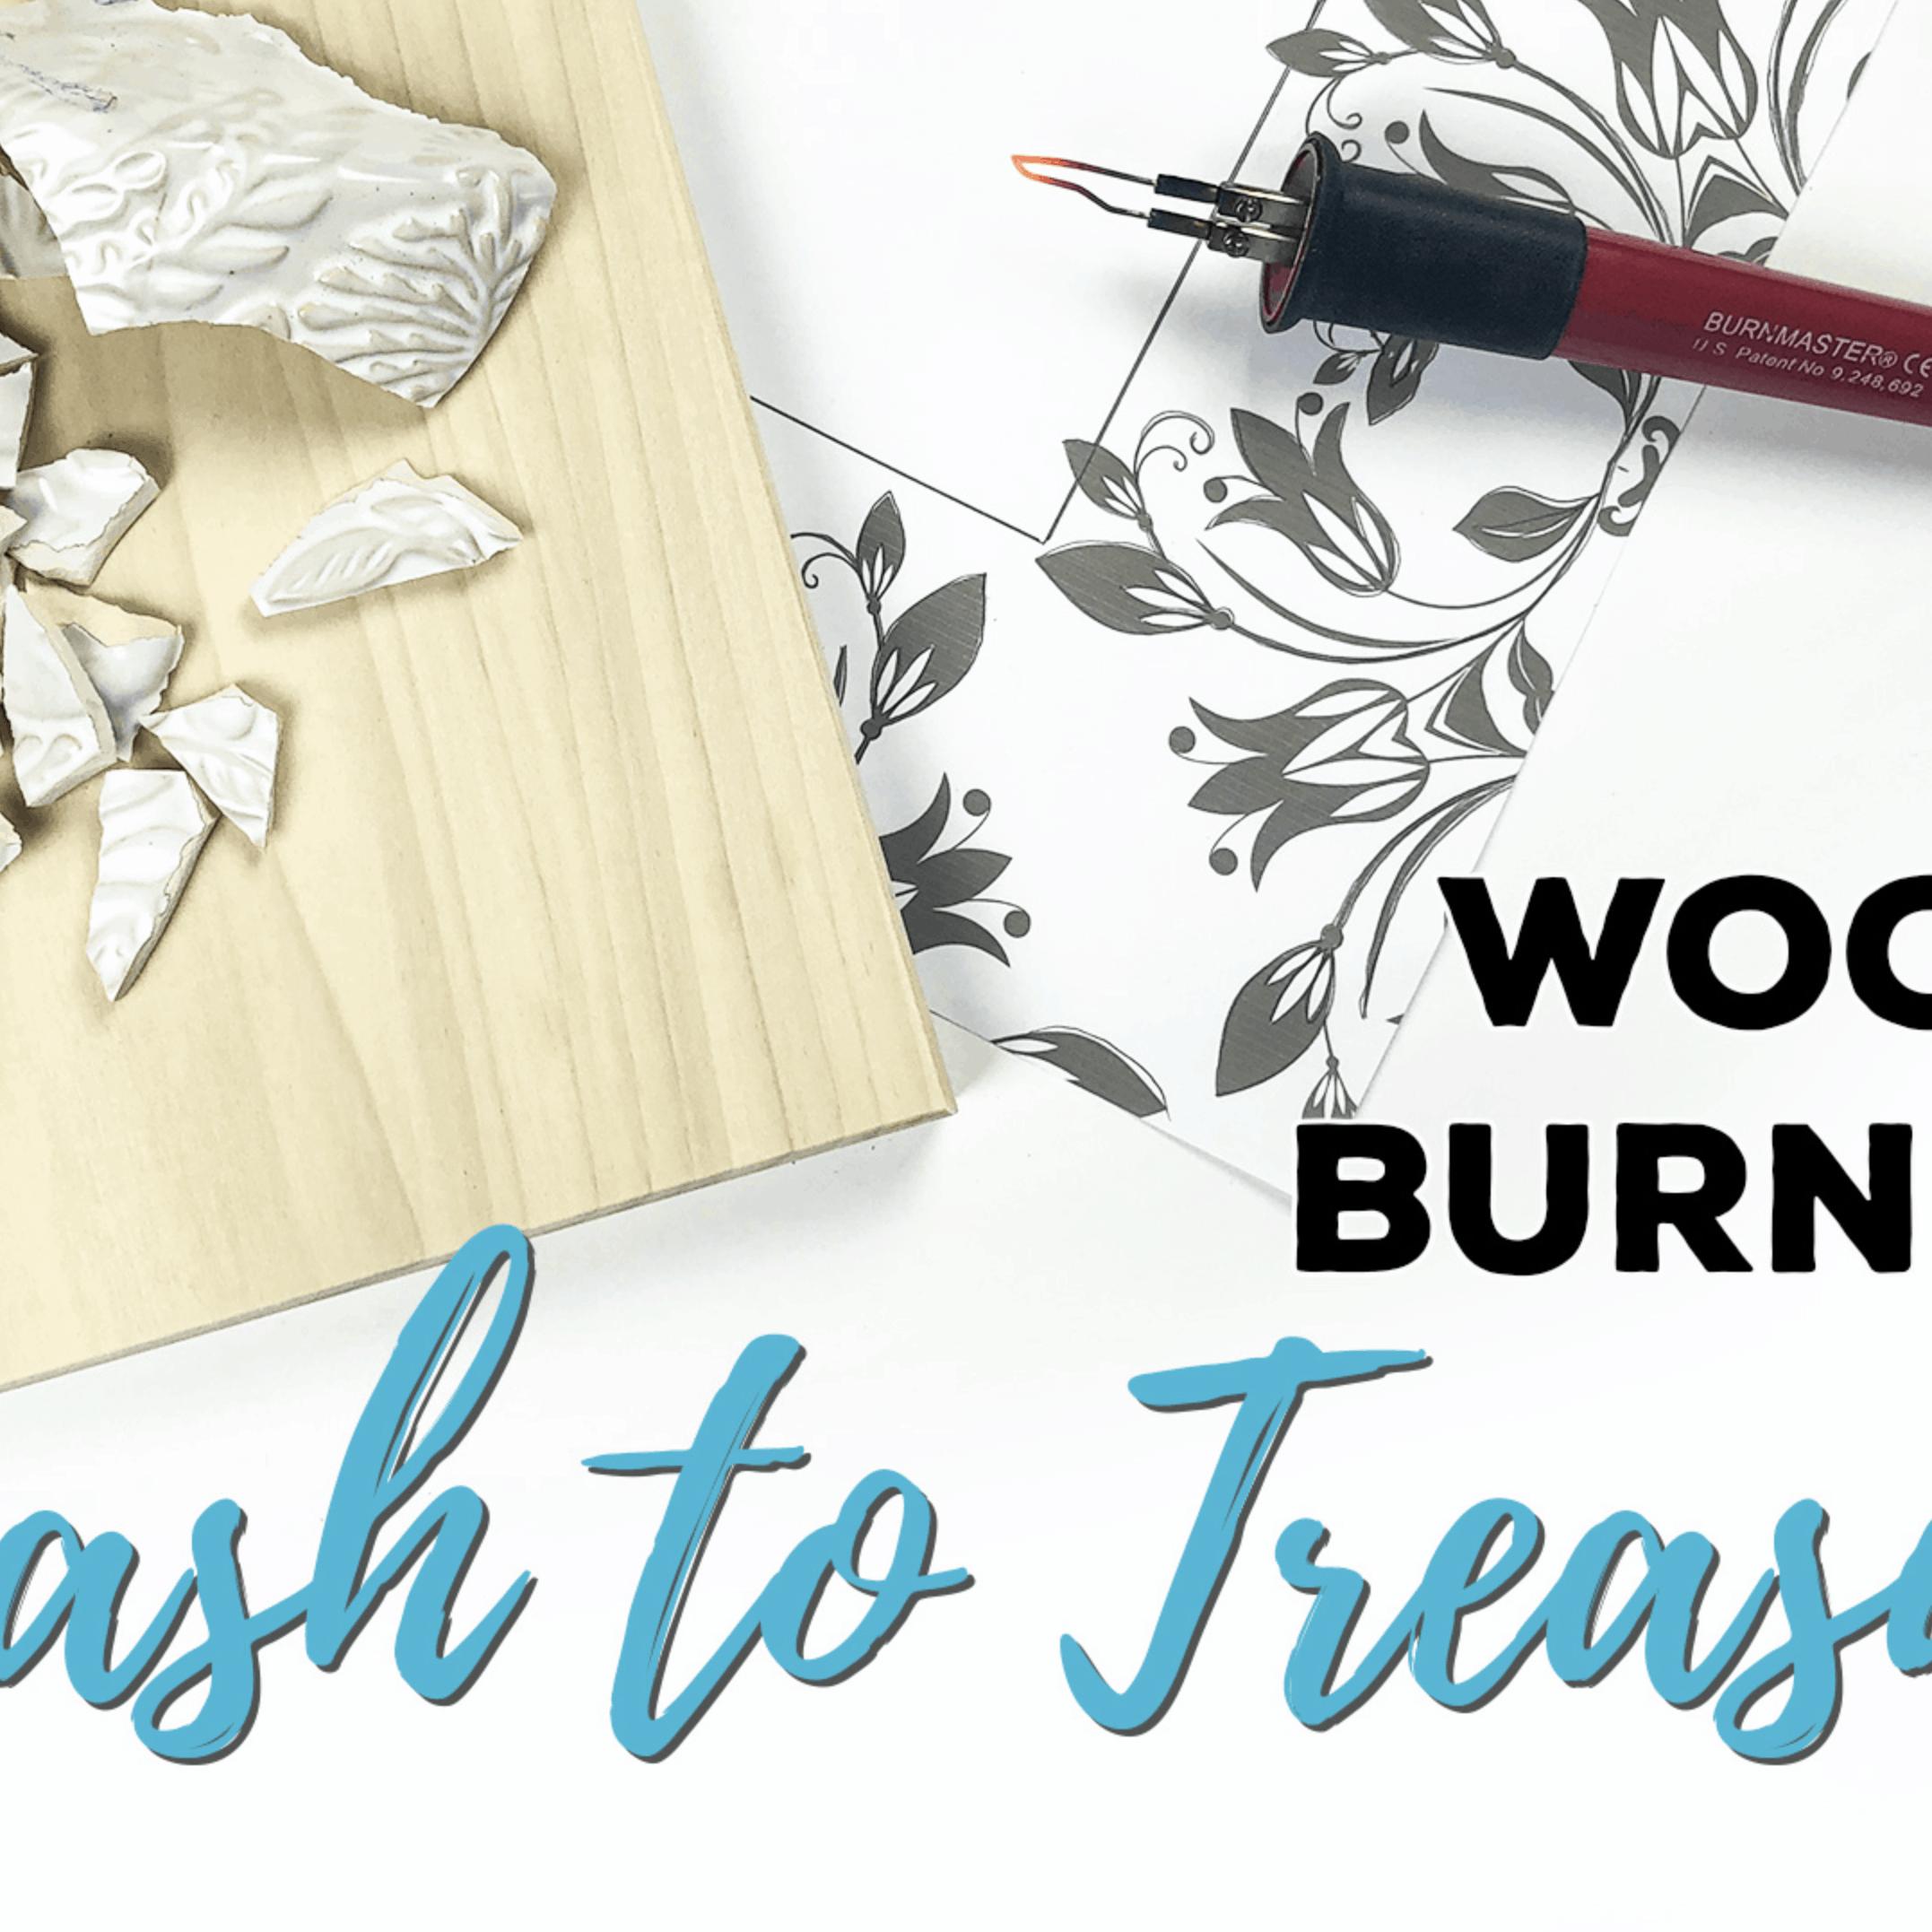 Wood Burning Art Trash to Treasure Piece.